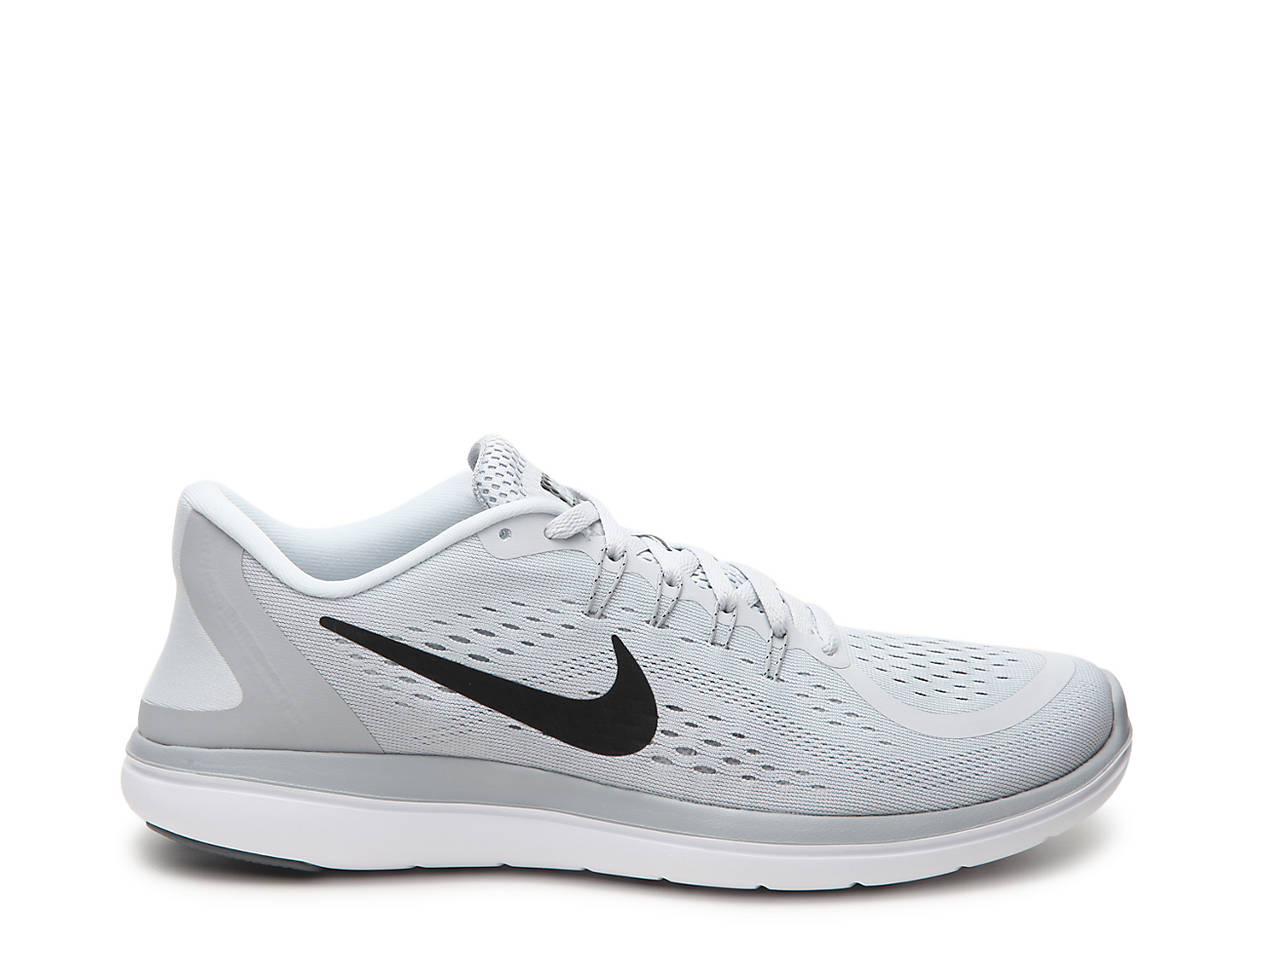 fa827f6b3766 Nike Flex 2017 RN Lightweight Running Shoe - Men s Men s Shoes